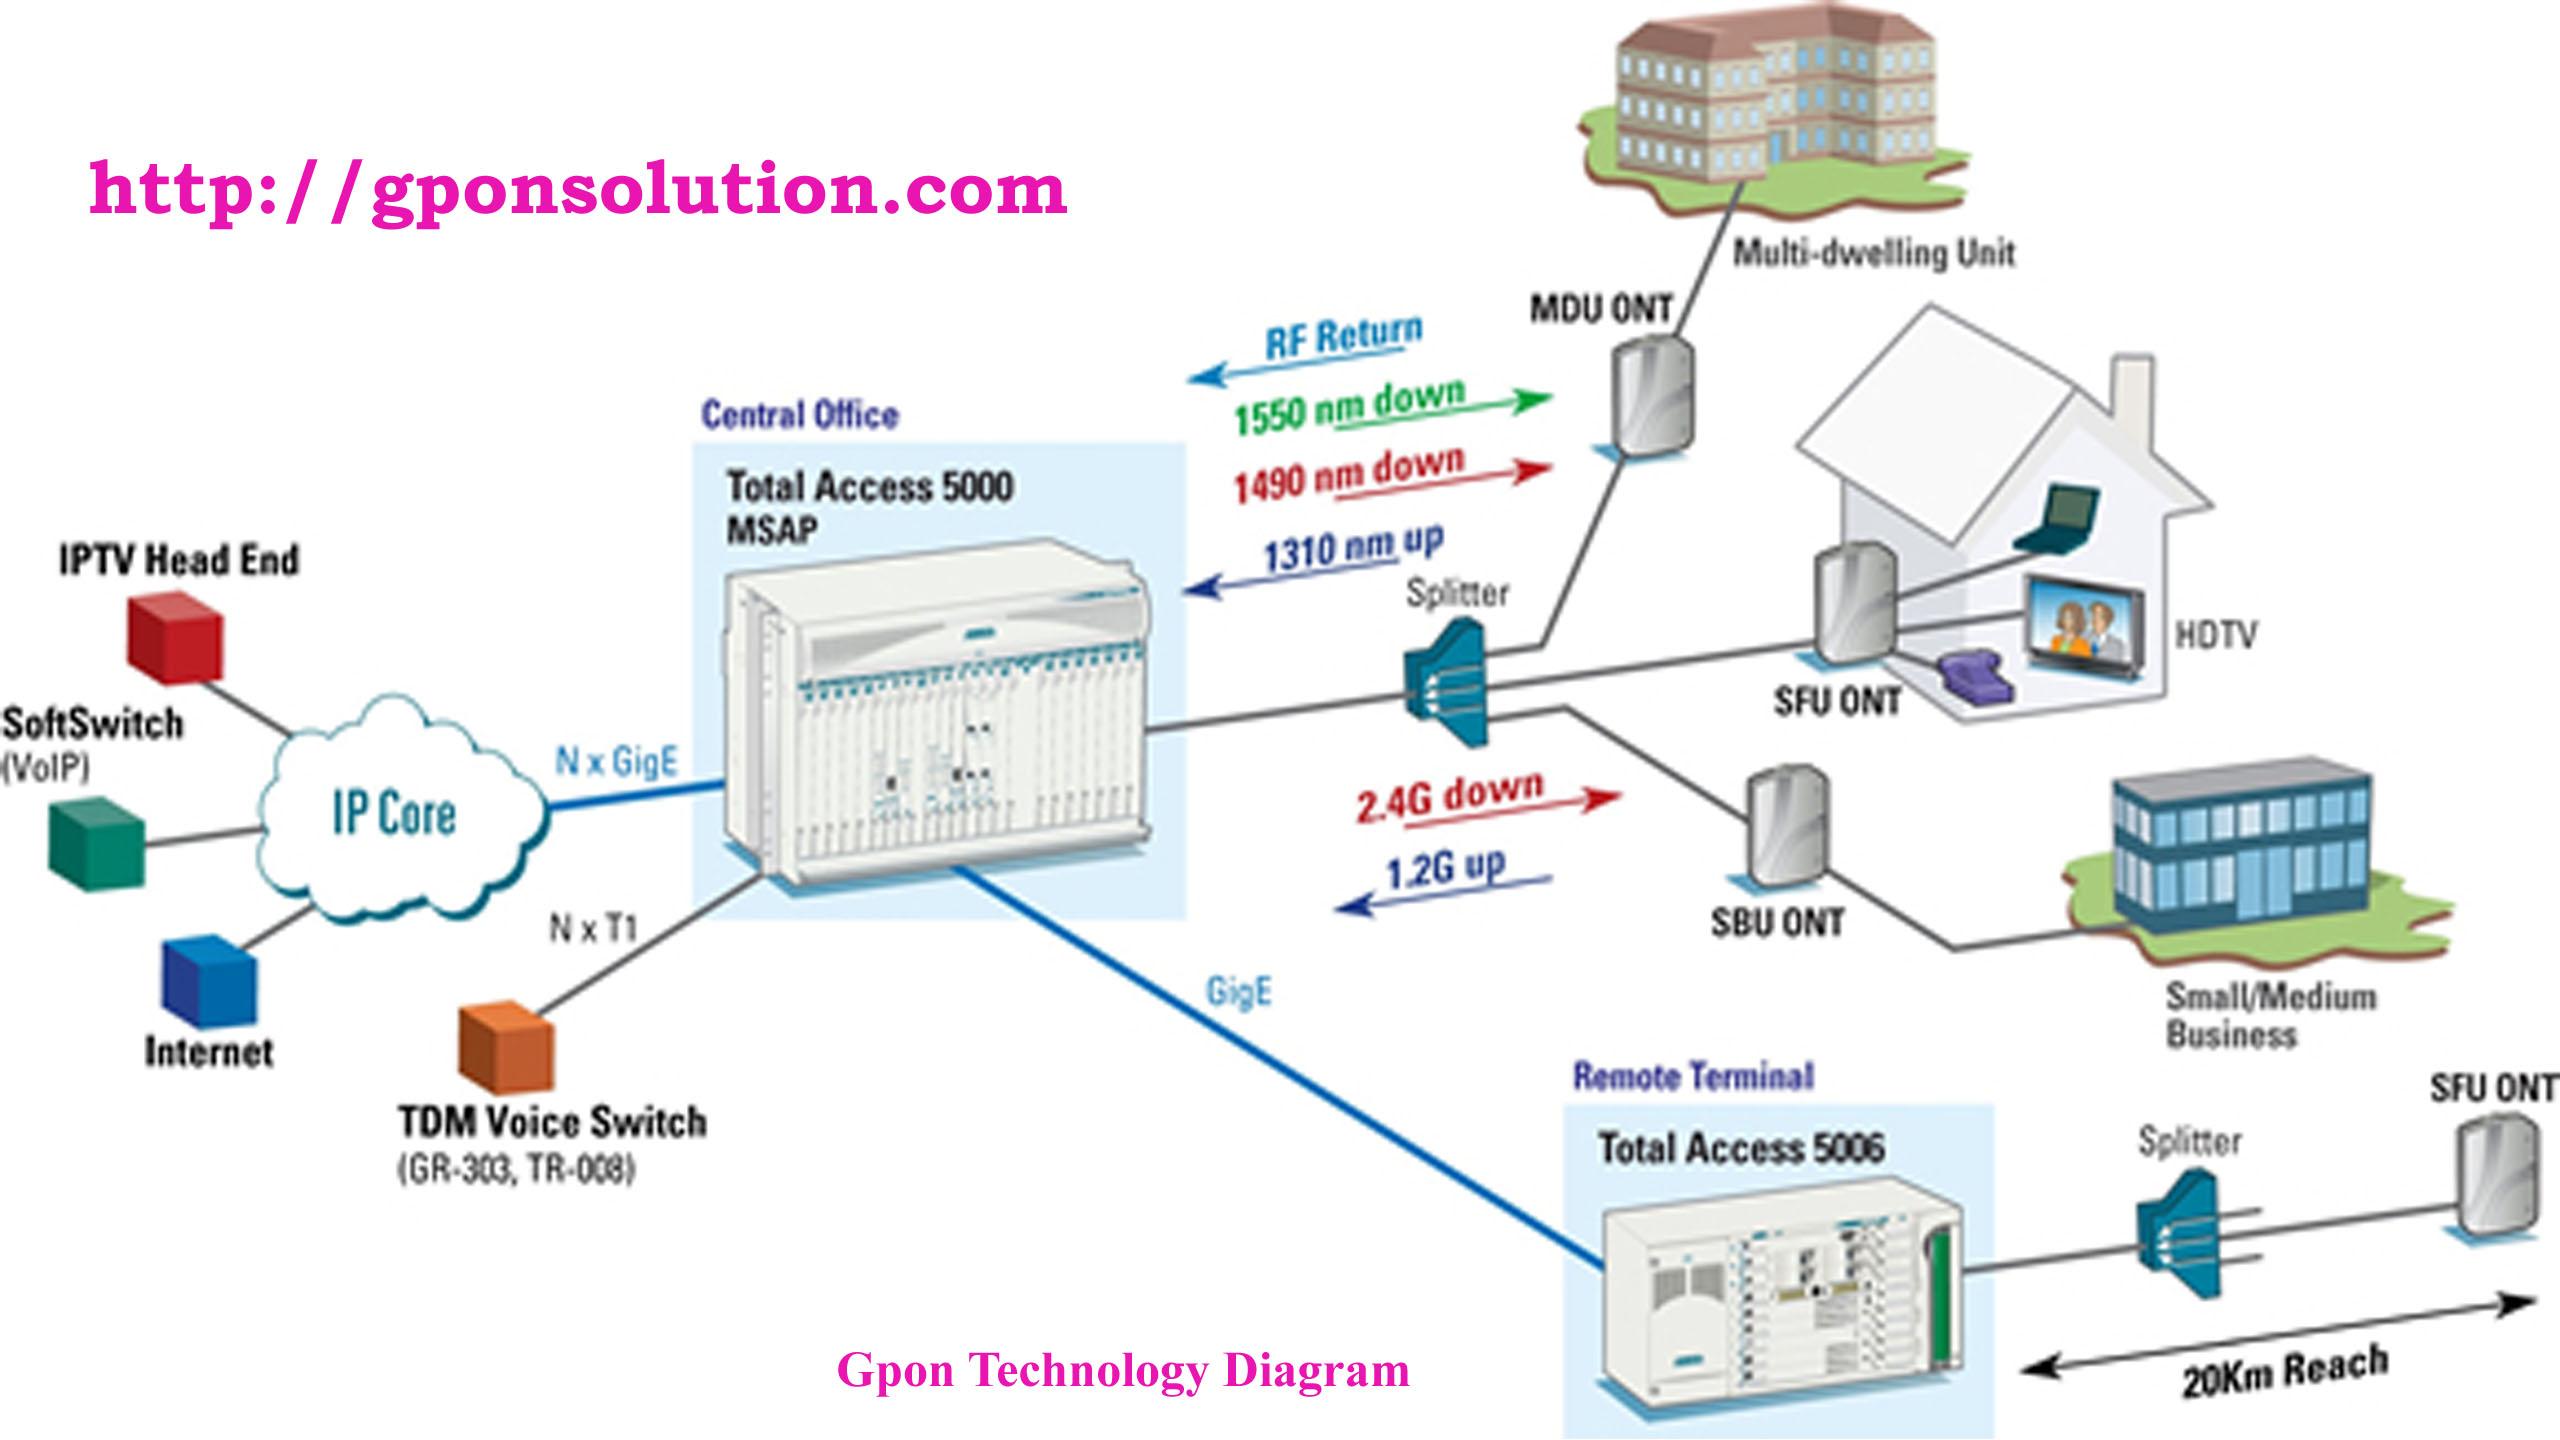 3d Cisco 2016 Hd Wallpaper Gpon Technology Diagram Overview Gpon Solution